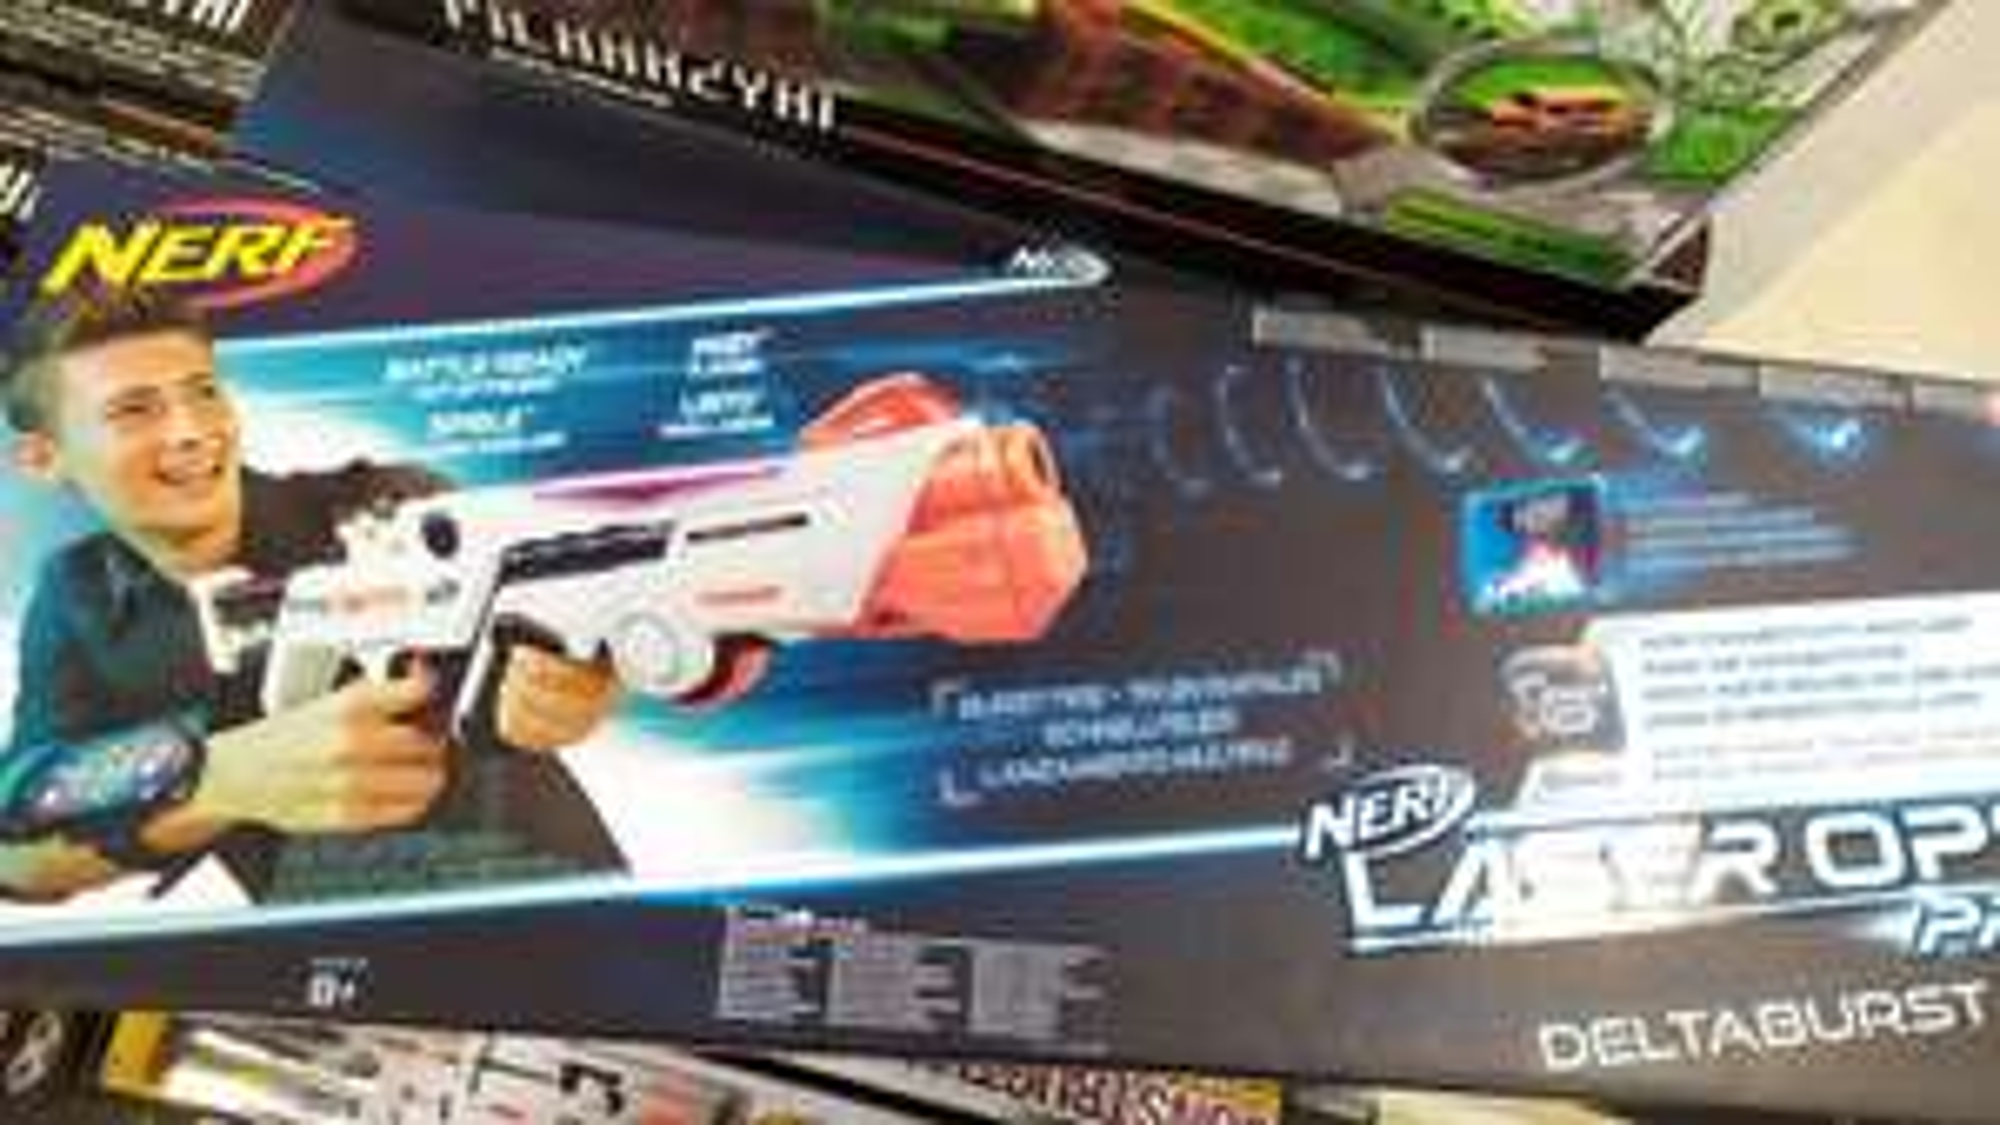 Nerf LaserOps pro przecena Pepco